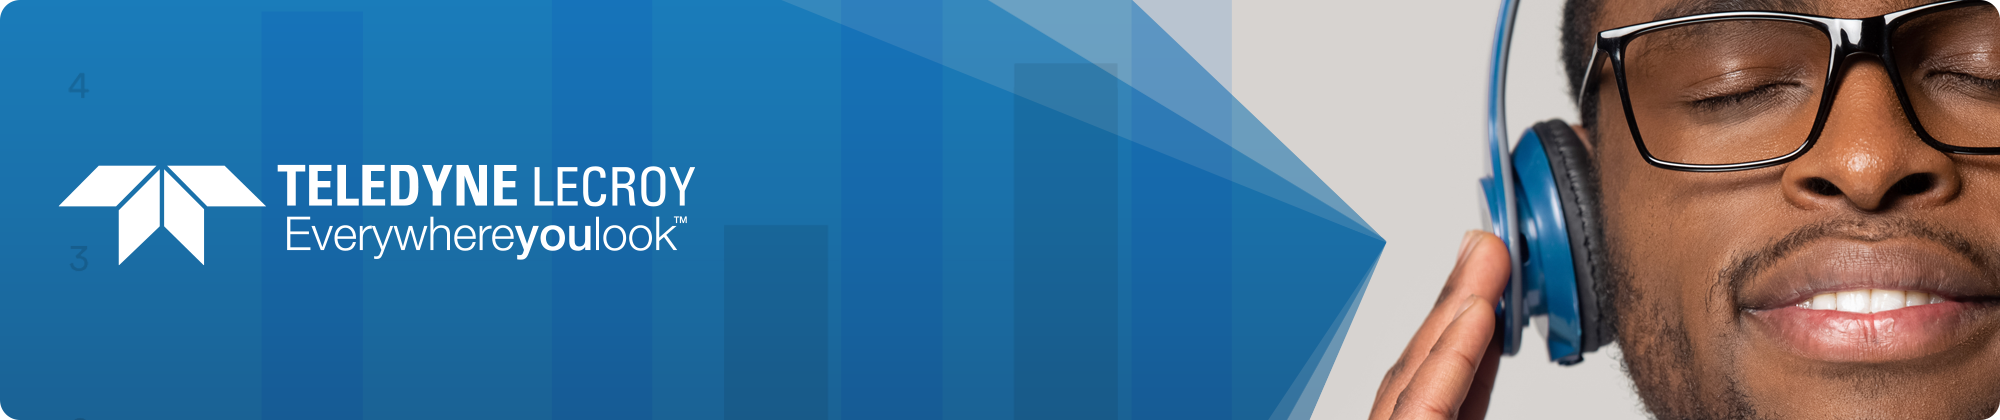 21-06-24_webinar_new_arch_for_next_gen_banner.png